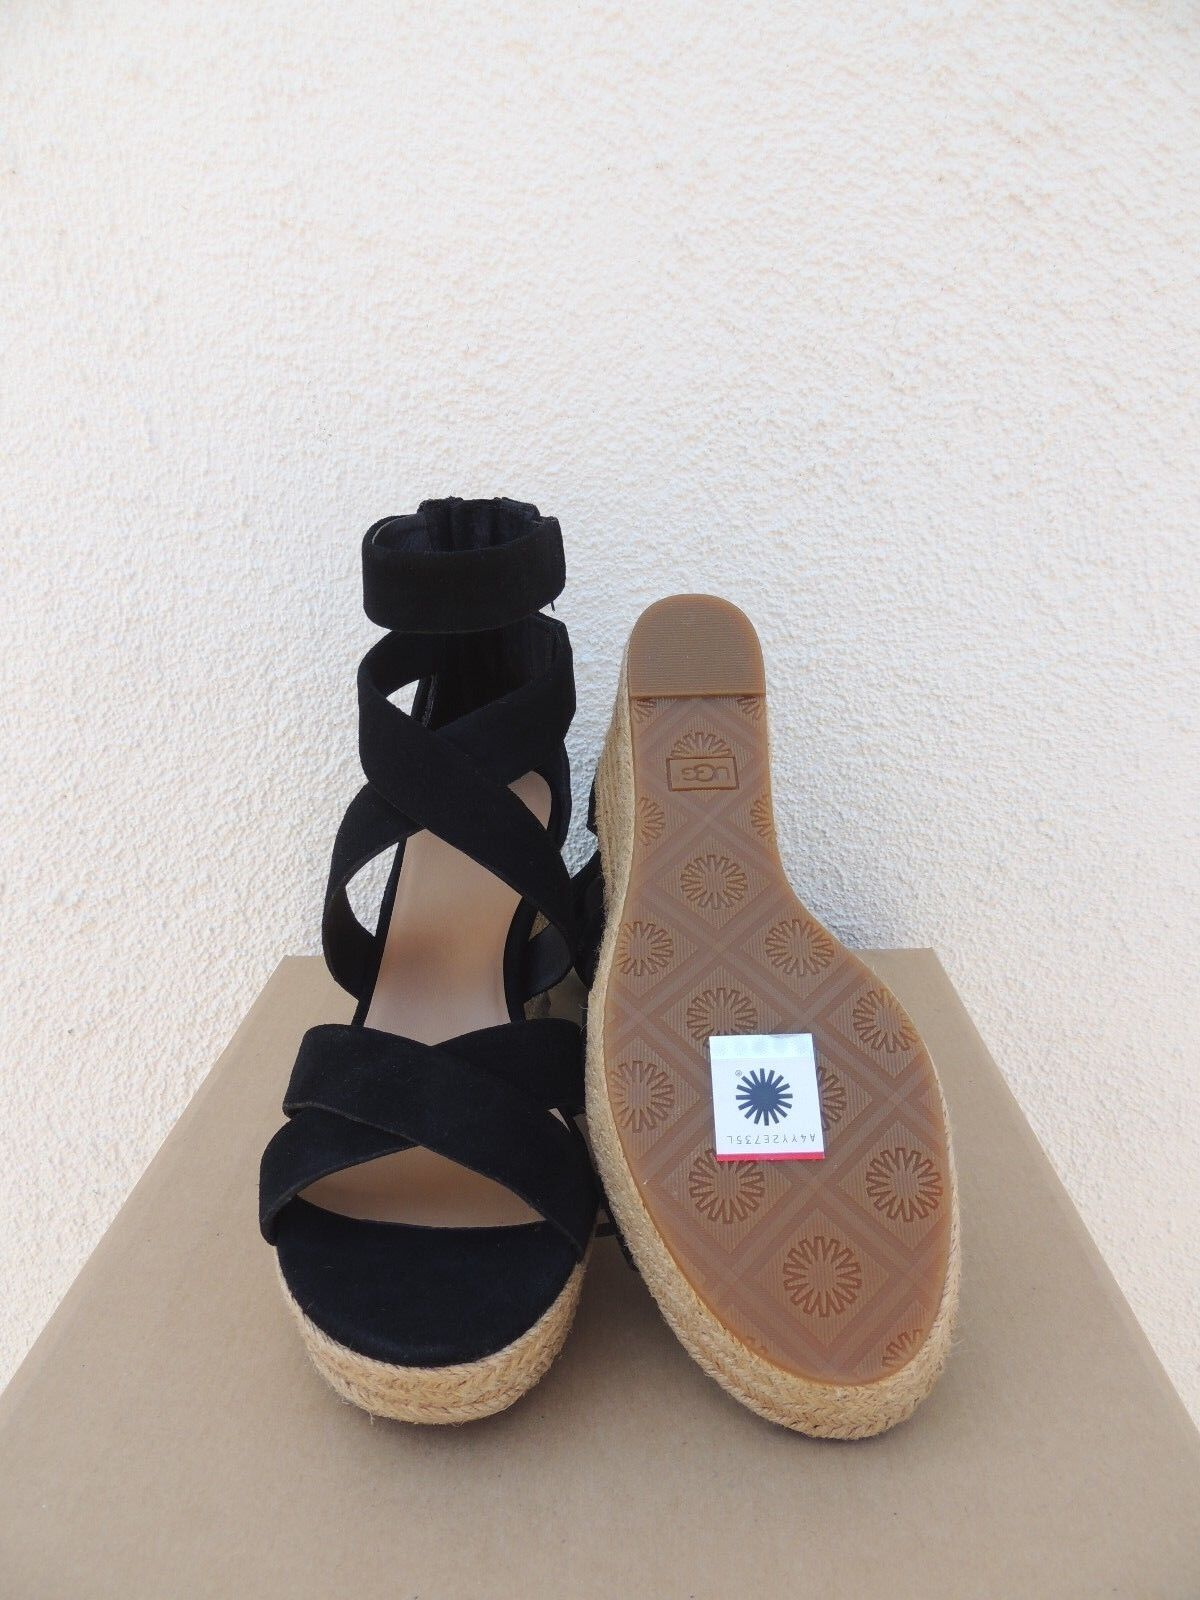 82cdd689462 UGG Raquel Black Suede Strappy Platform Wedge HEELS US 9/ EUR 40